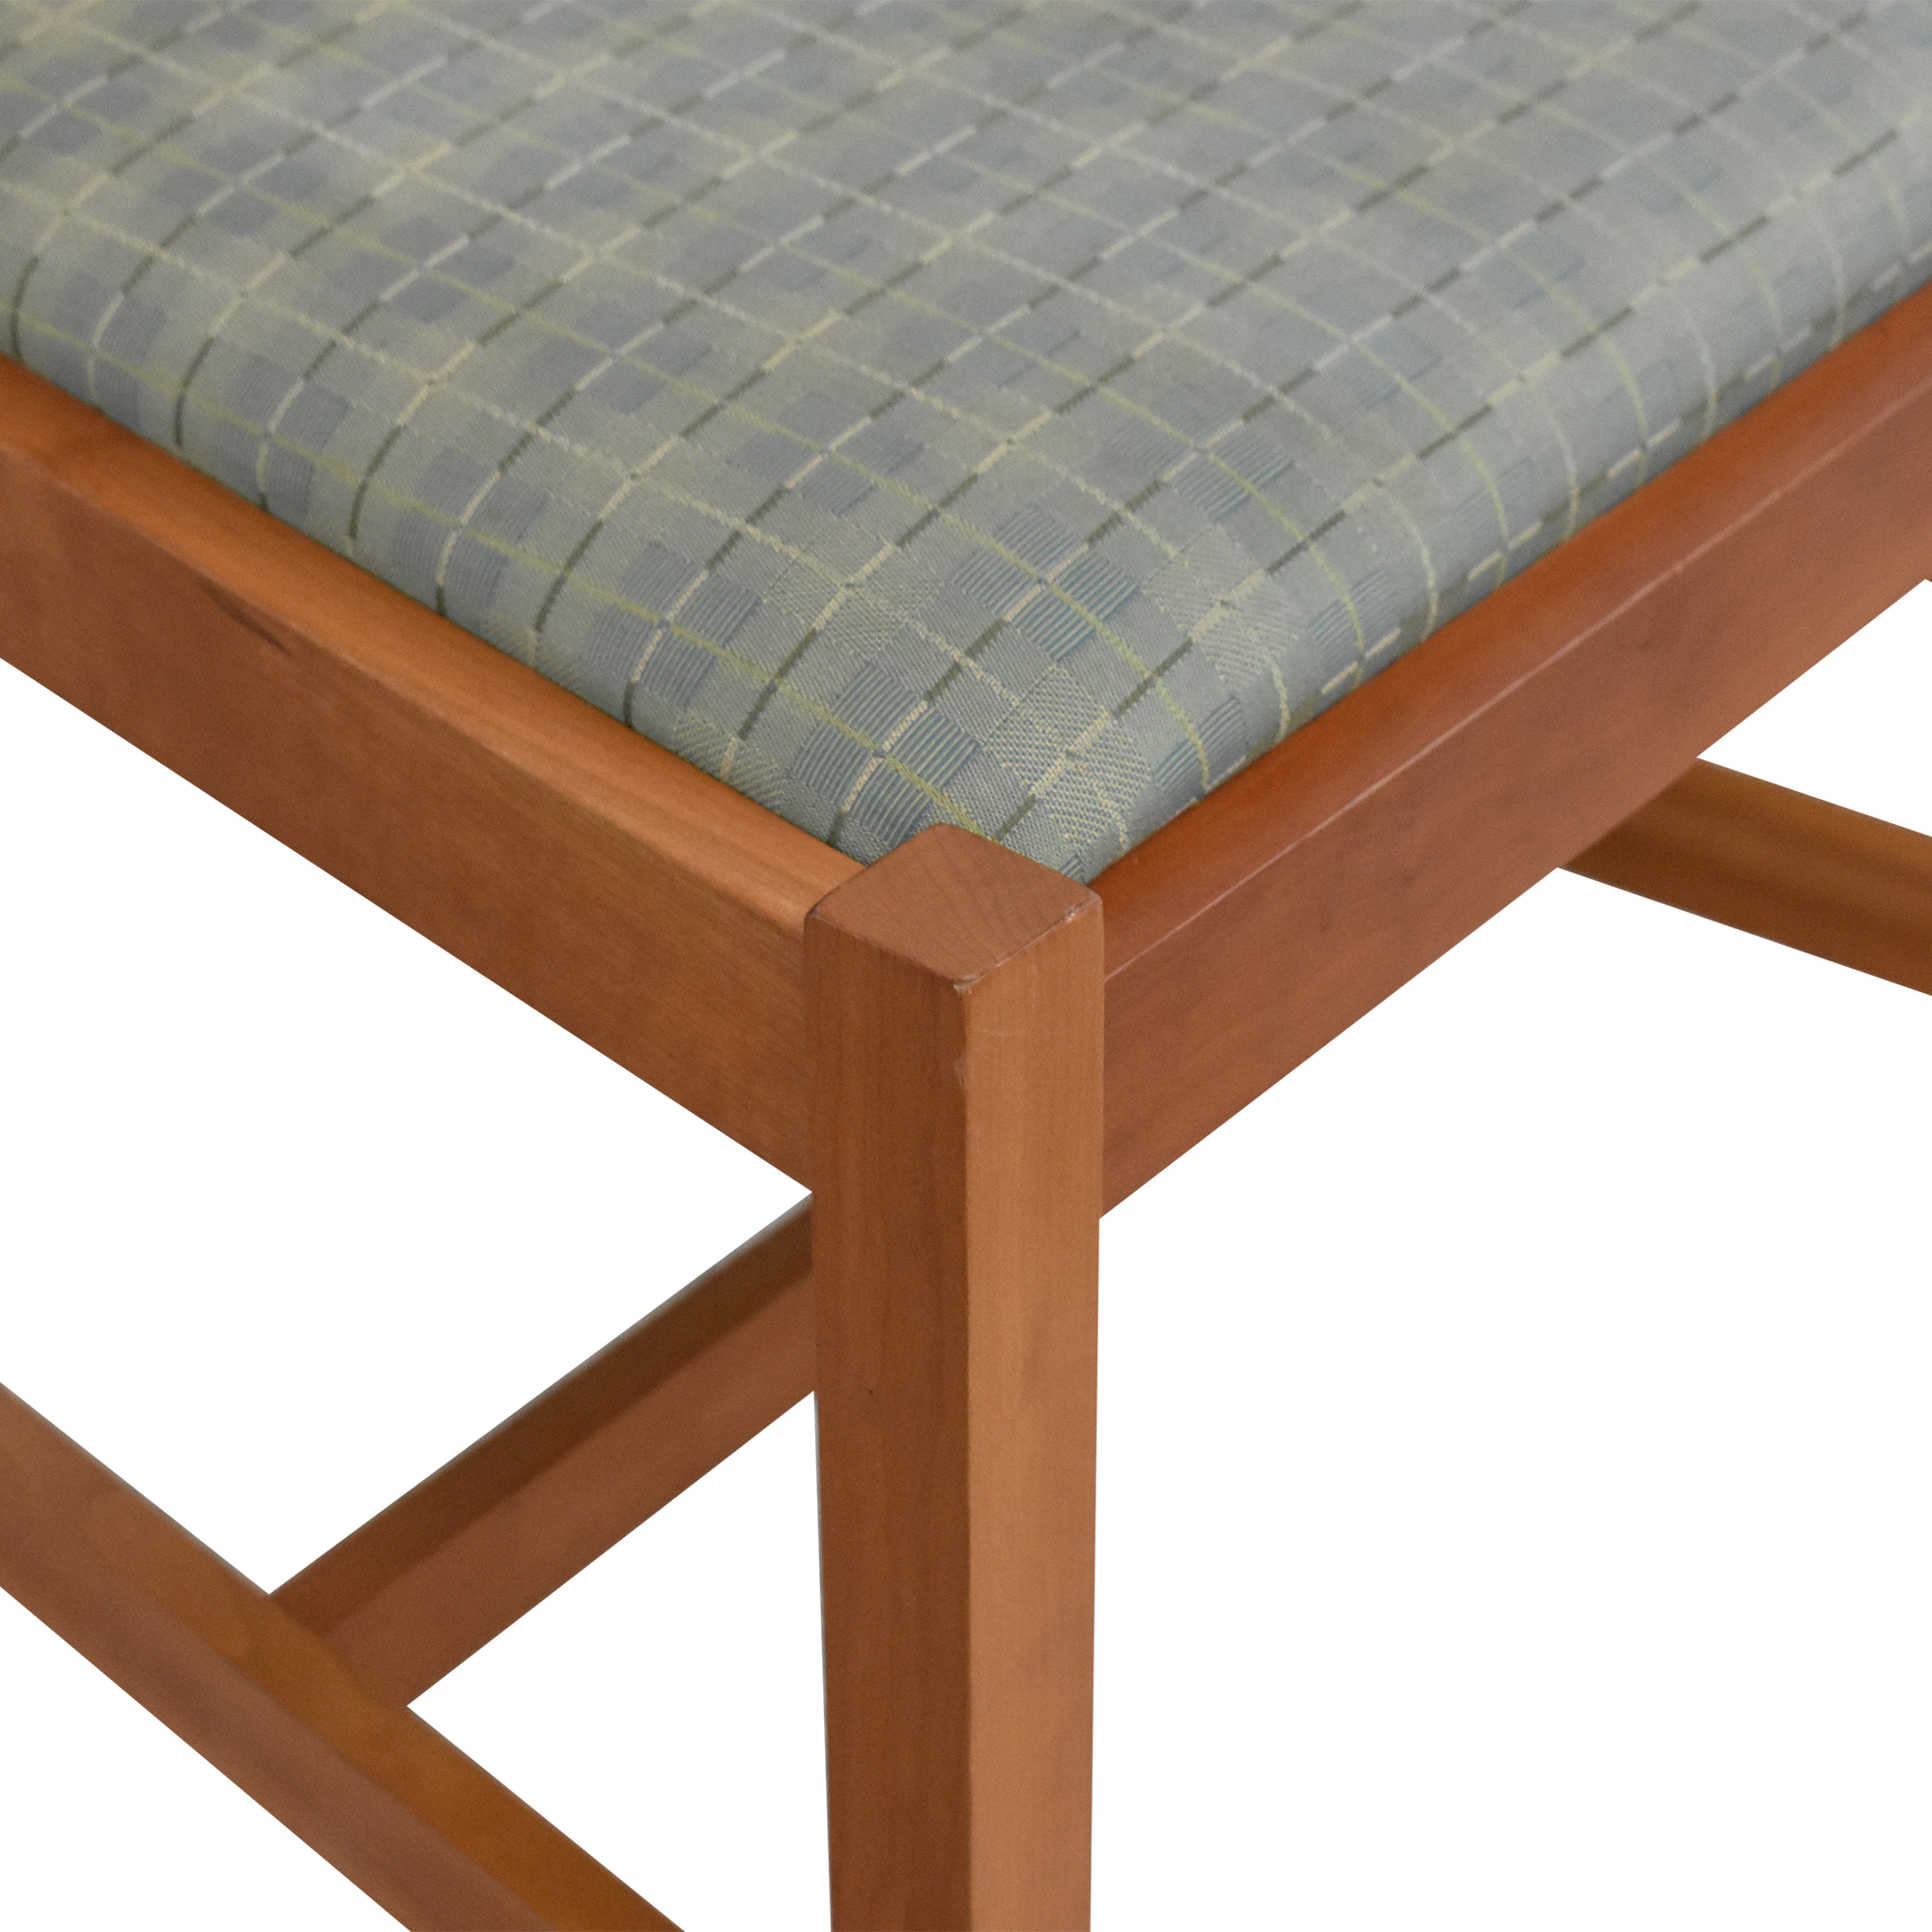 Scott Jordan Furniture Scott Jordan Mission Style Dining Chairs on sale